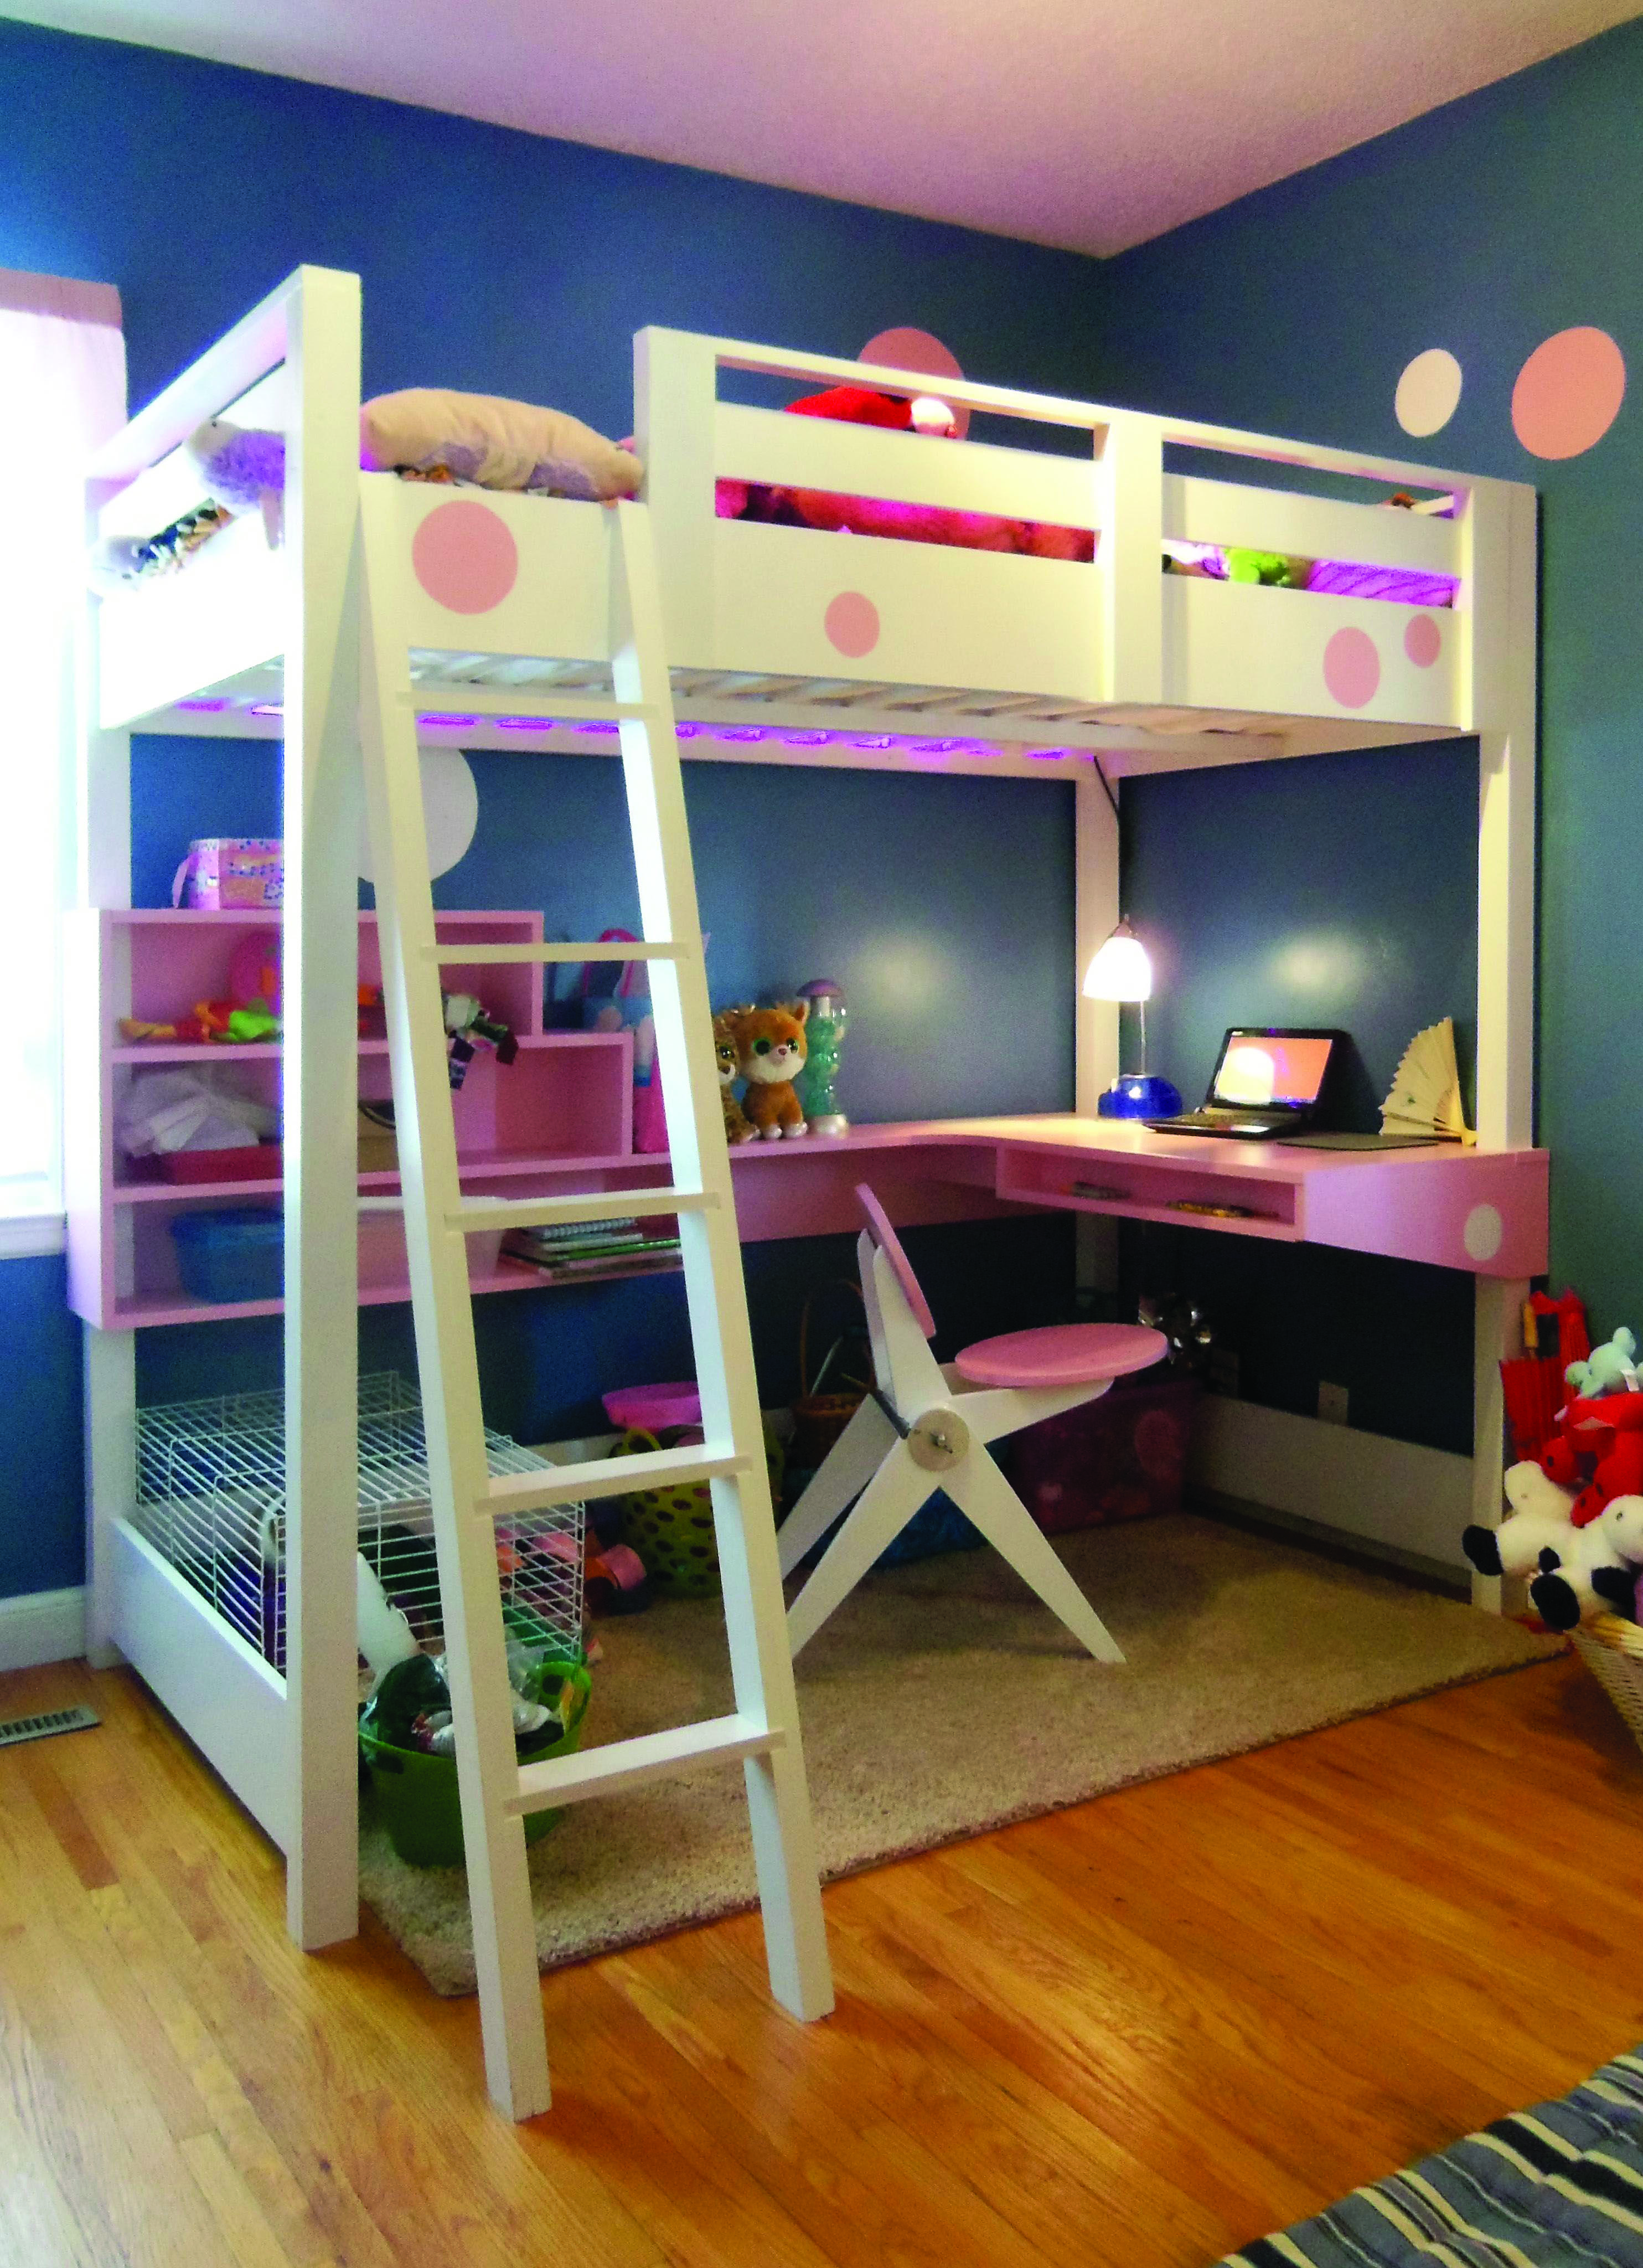 8 Loft Bedroom Ideas For Your Tiny Bed Room Diy Loft Bed Loft